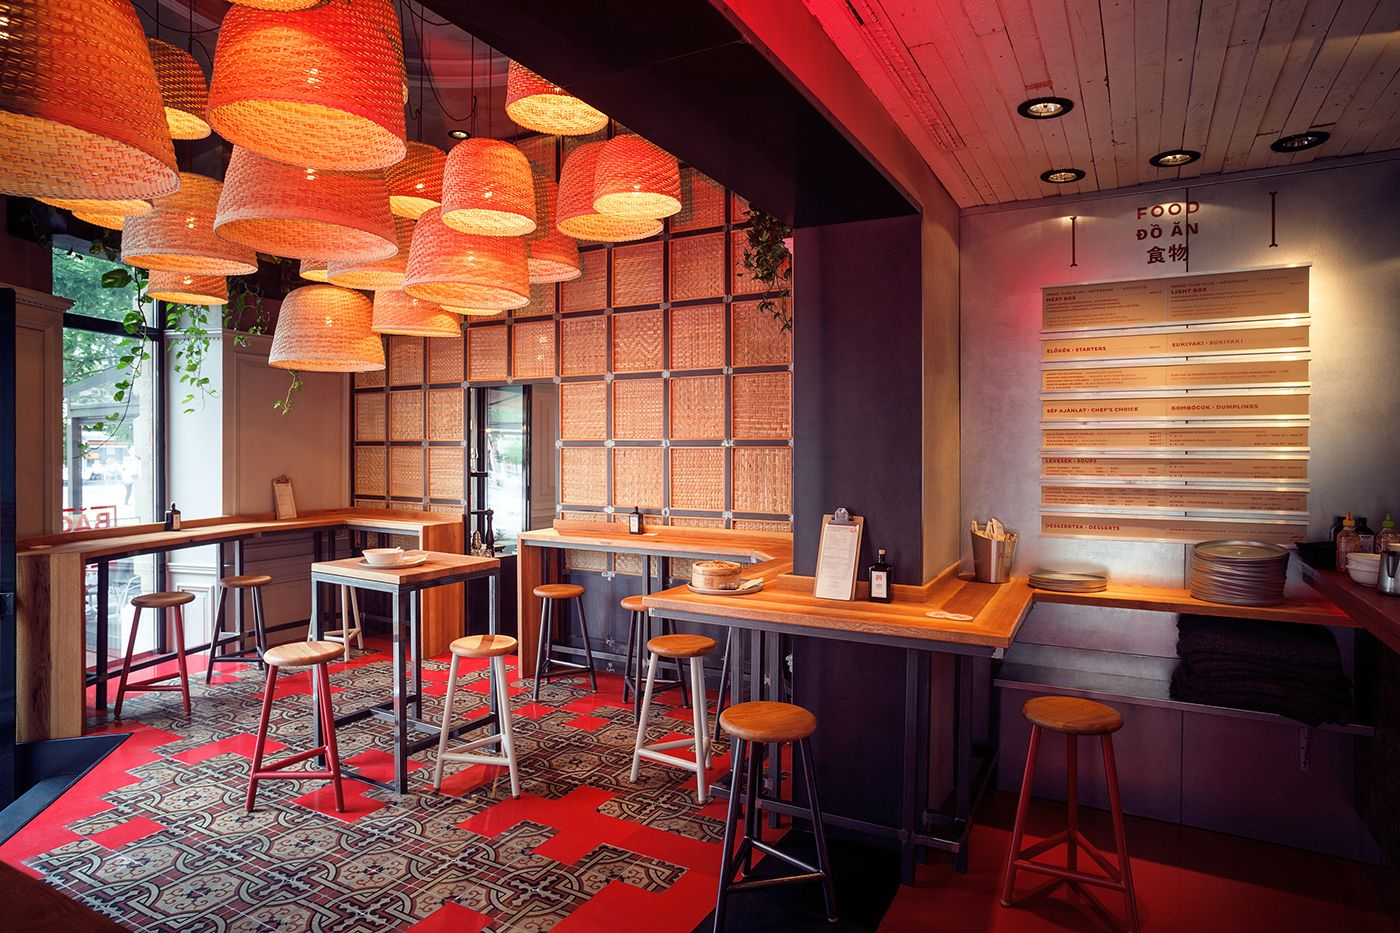 Asian bistro restaurant concept